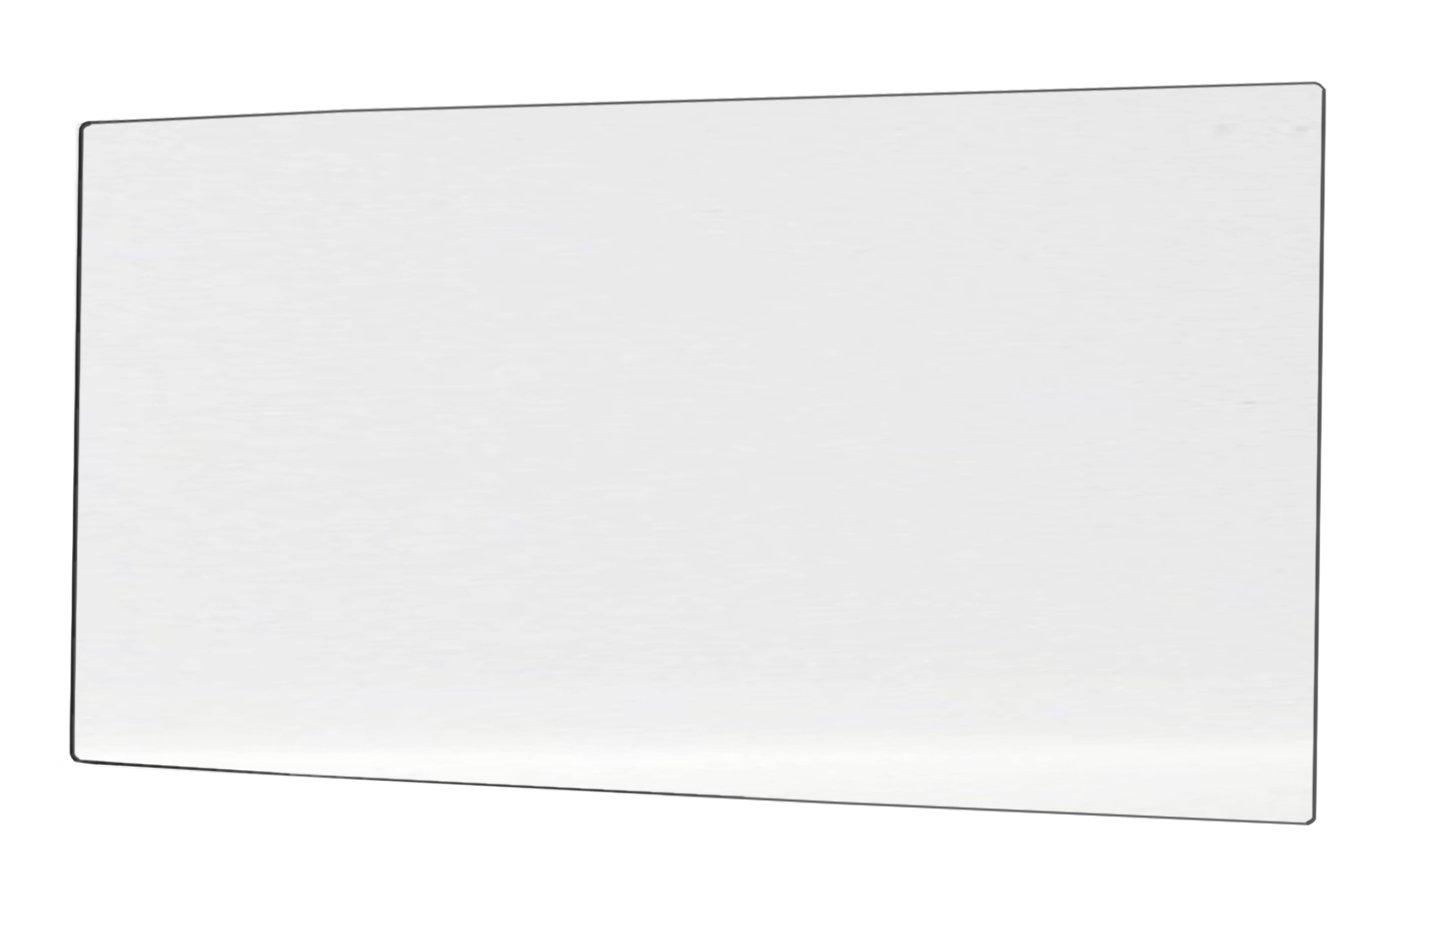 "12"" x 24"" 1/8""Acrylic Mirror Sheet"